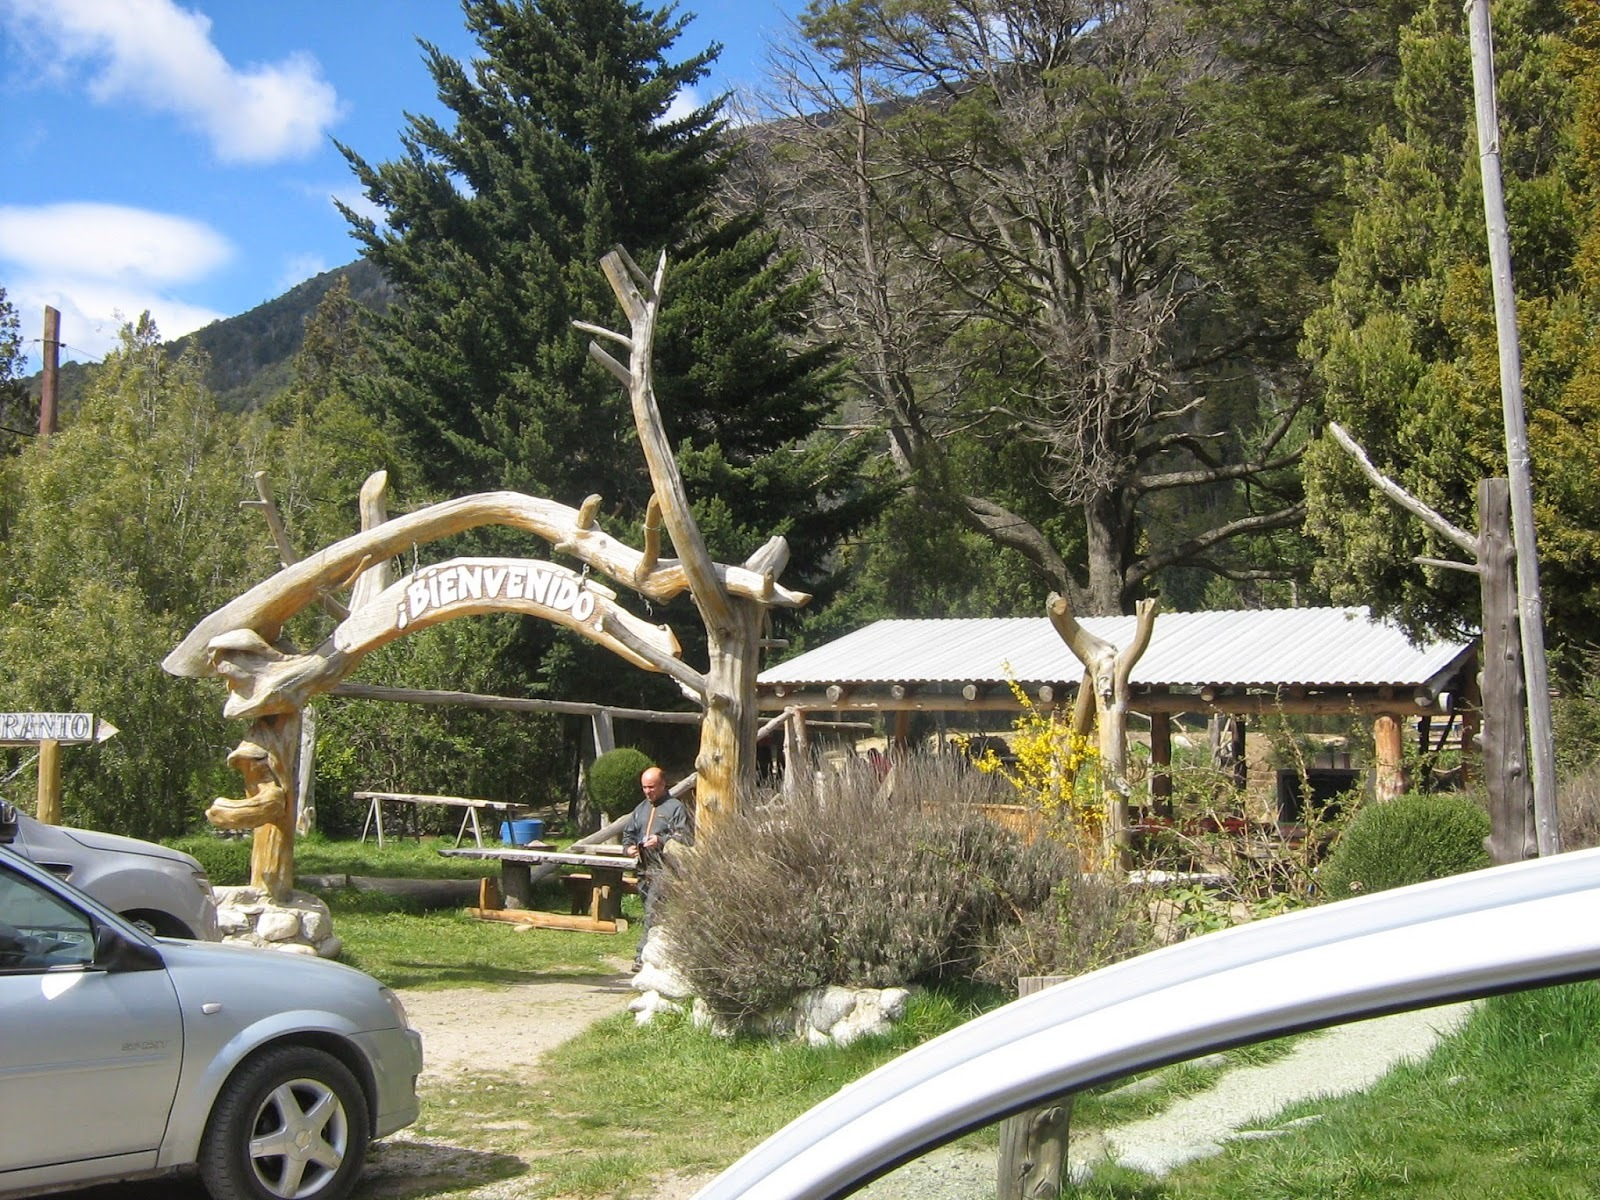 La cocina patagónica (I)